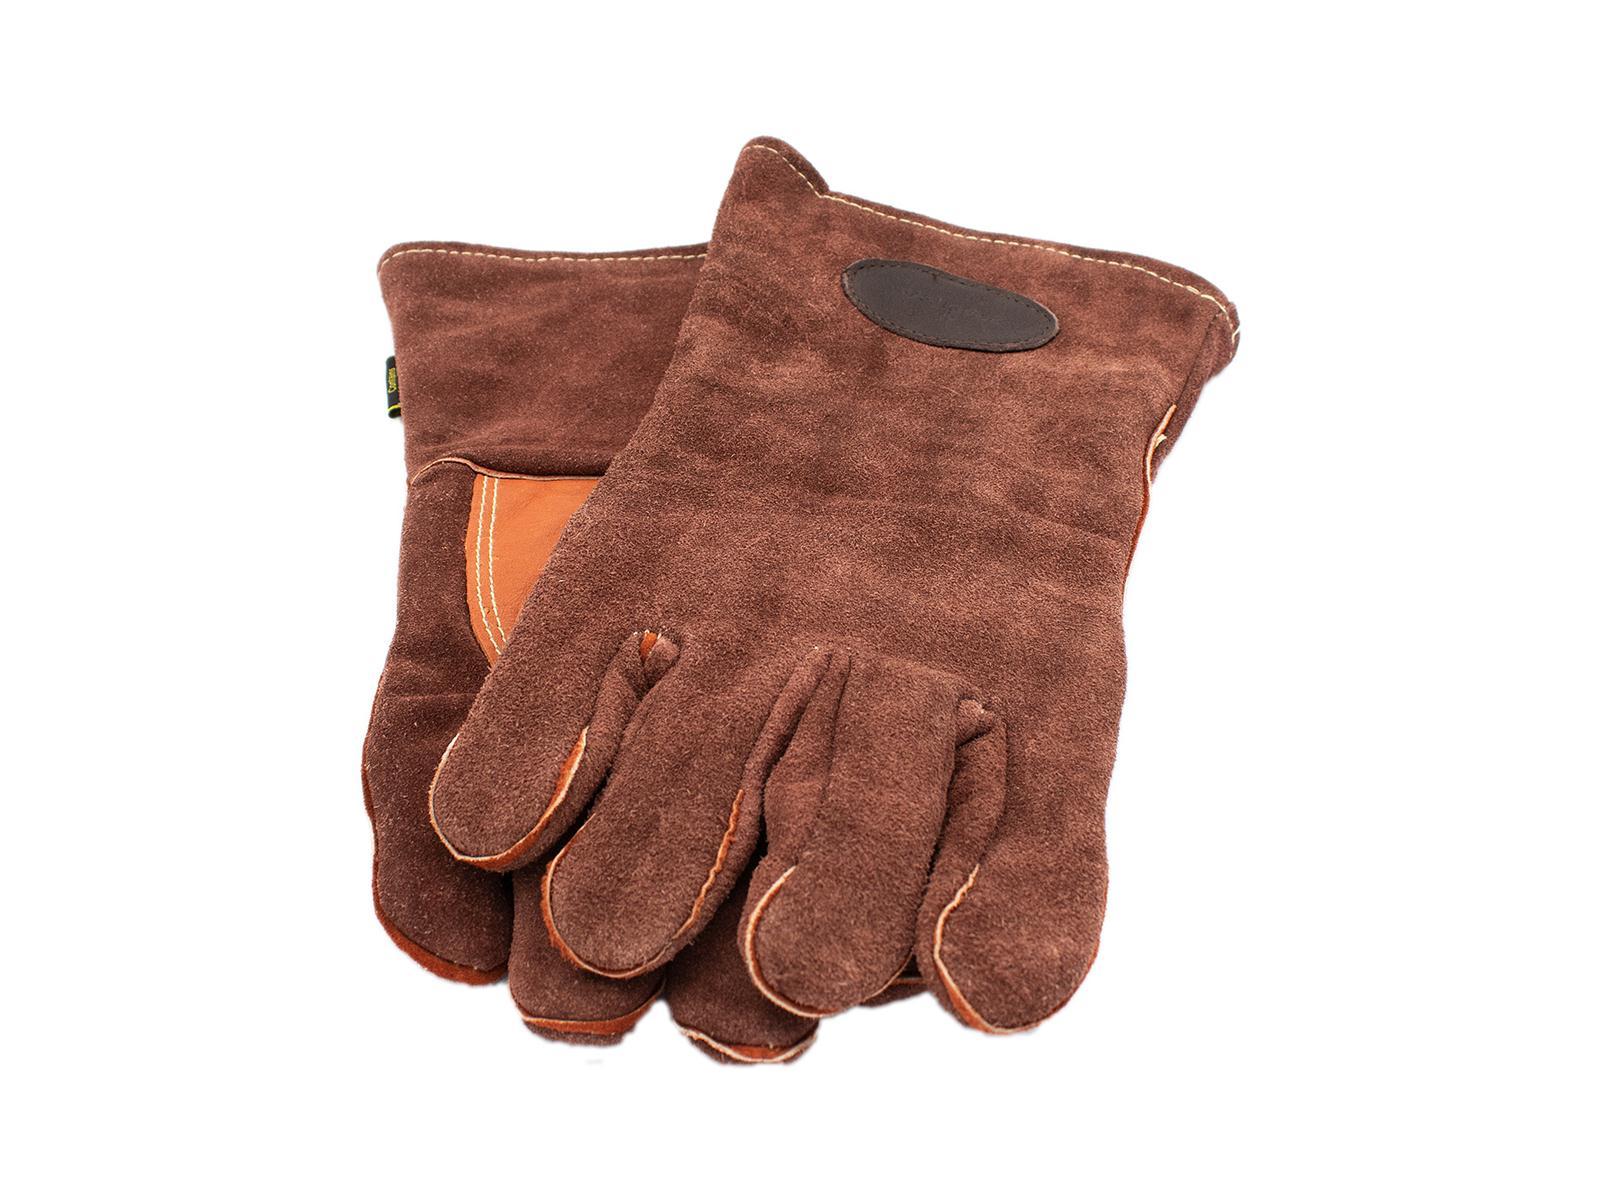 BRADLEYS Handschuhe für Holzfäller, Wildleder, braun